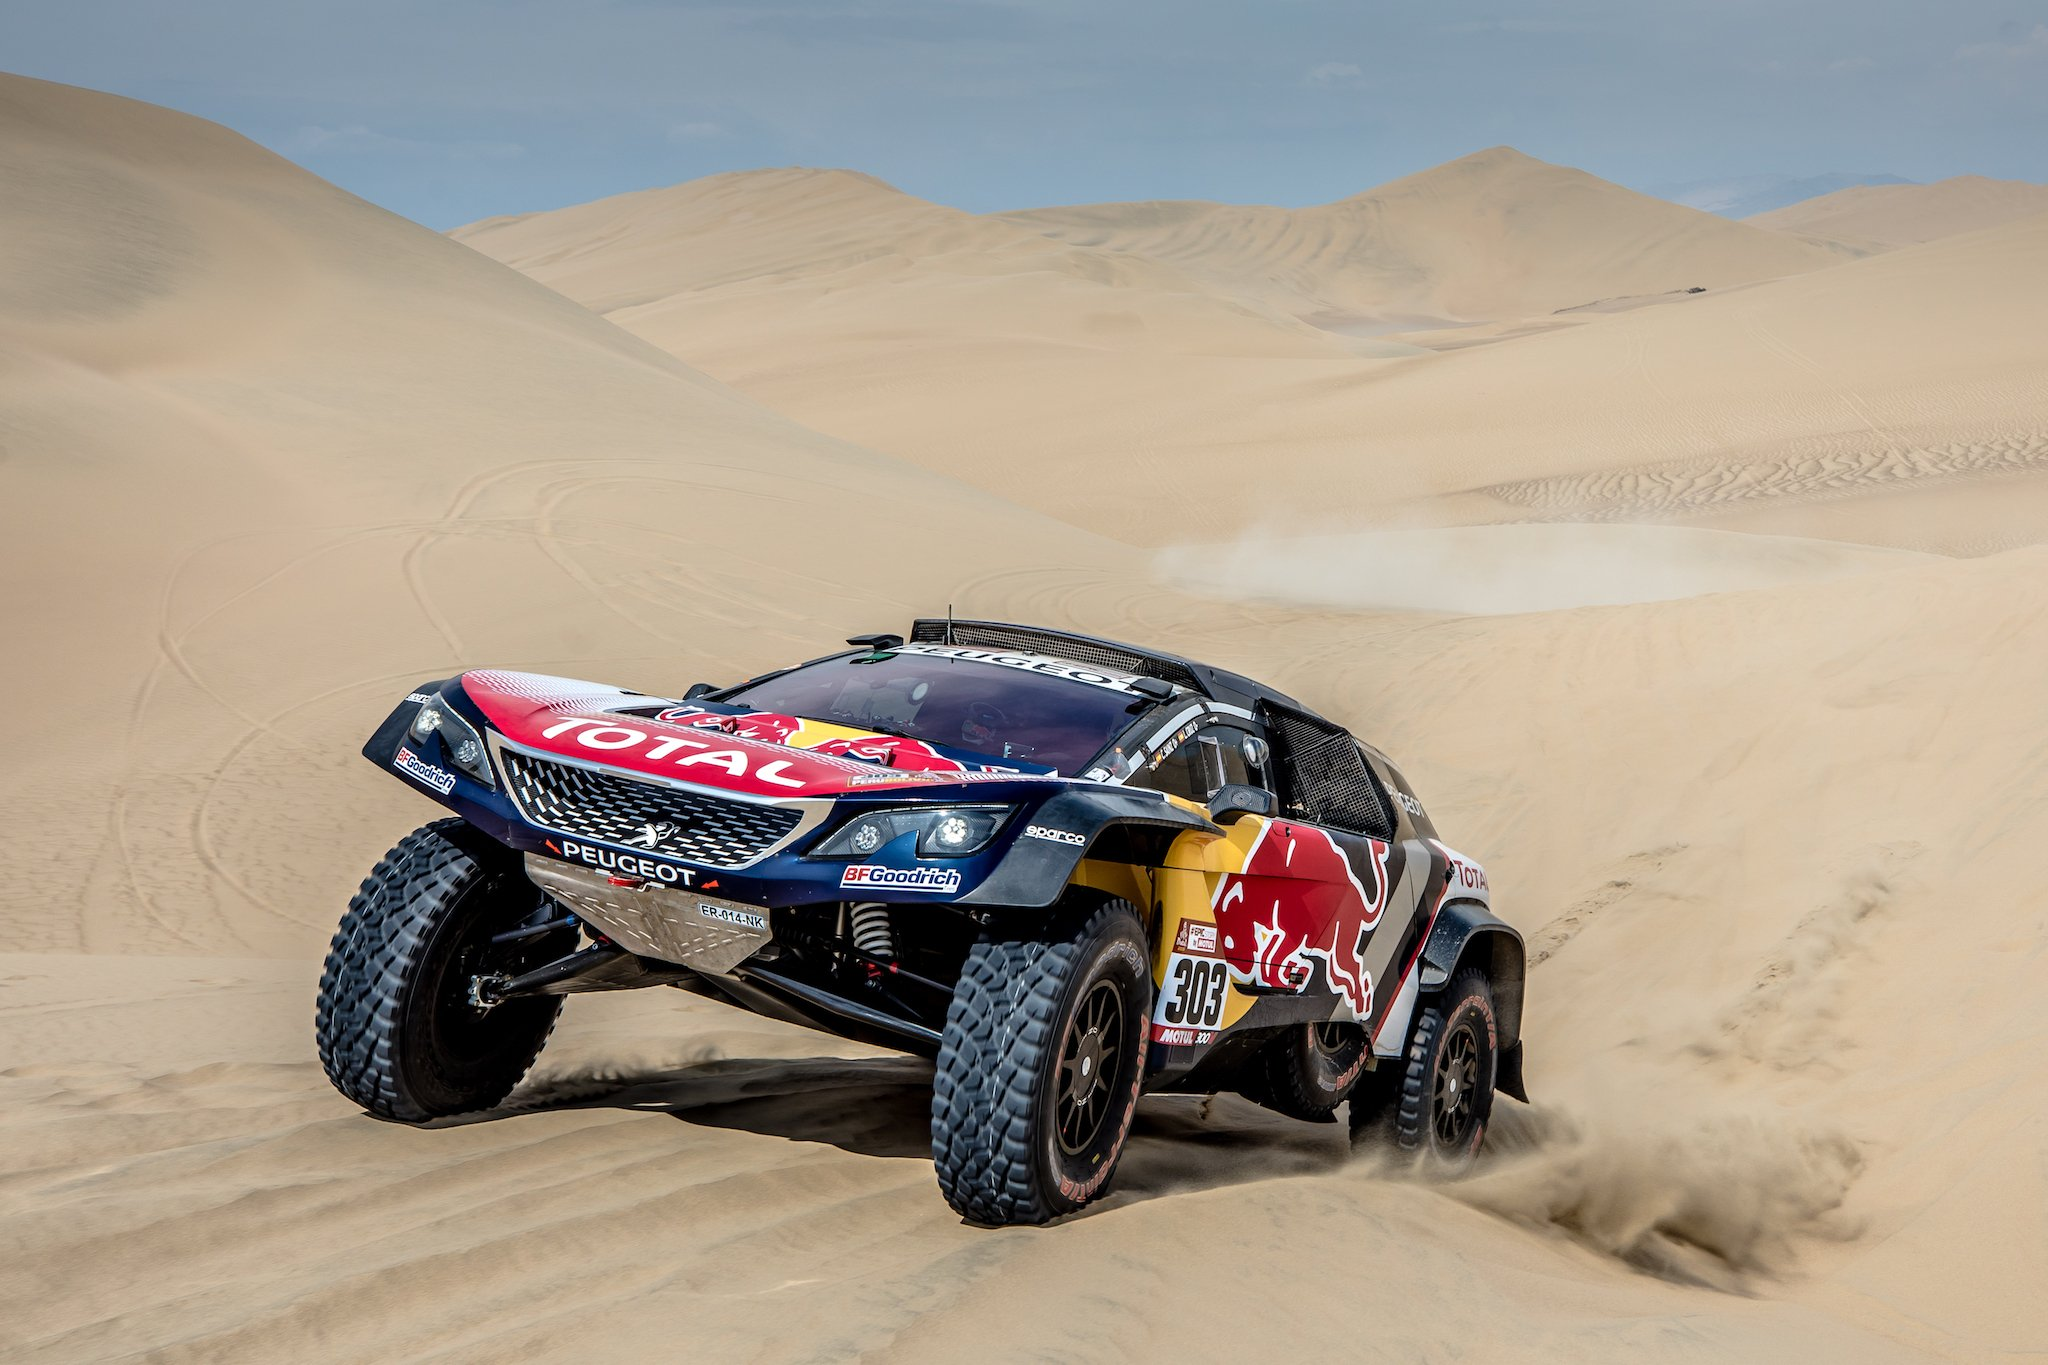 Rally Dakar 2018 - Página 2 DS8HofQWkAAfMcT